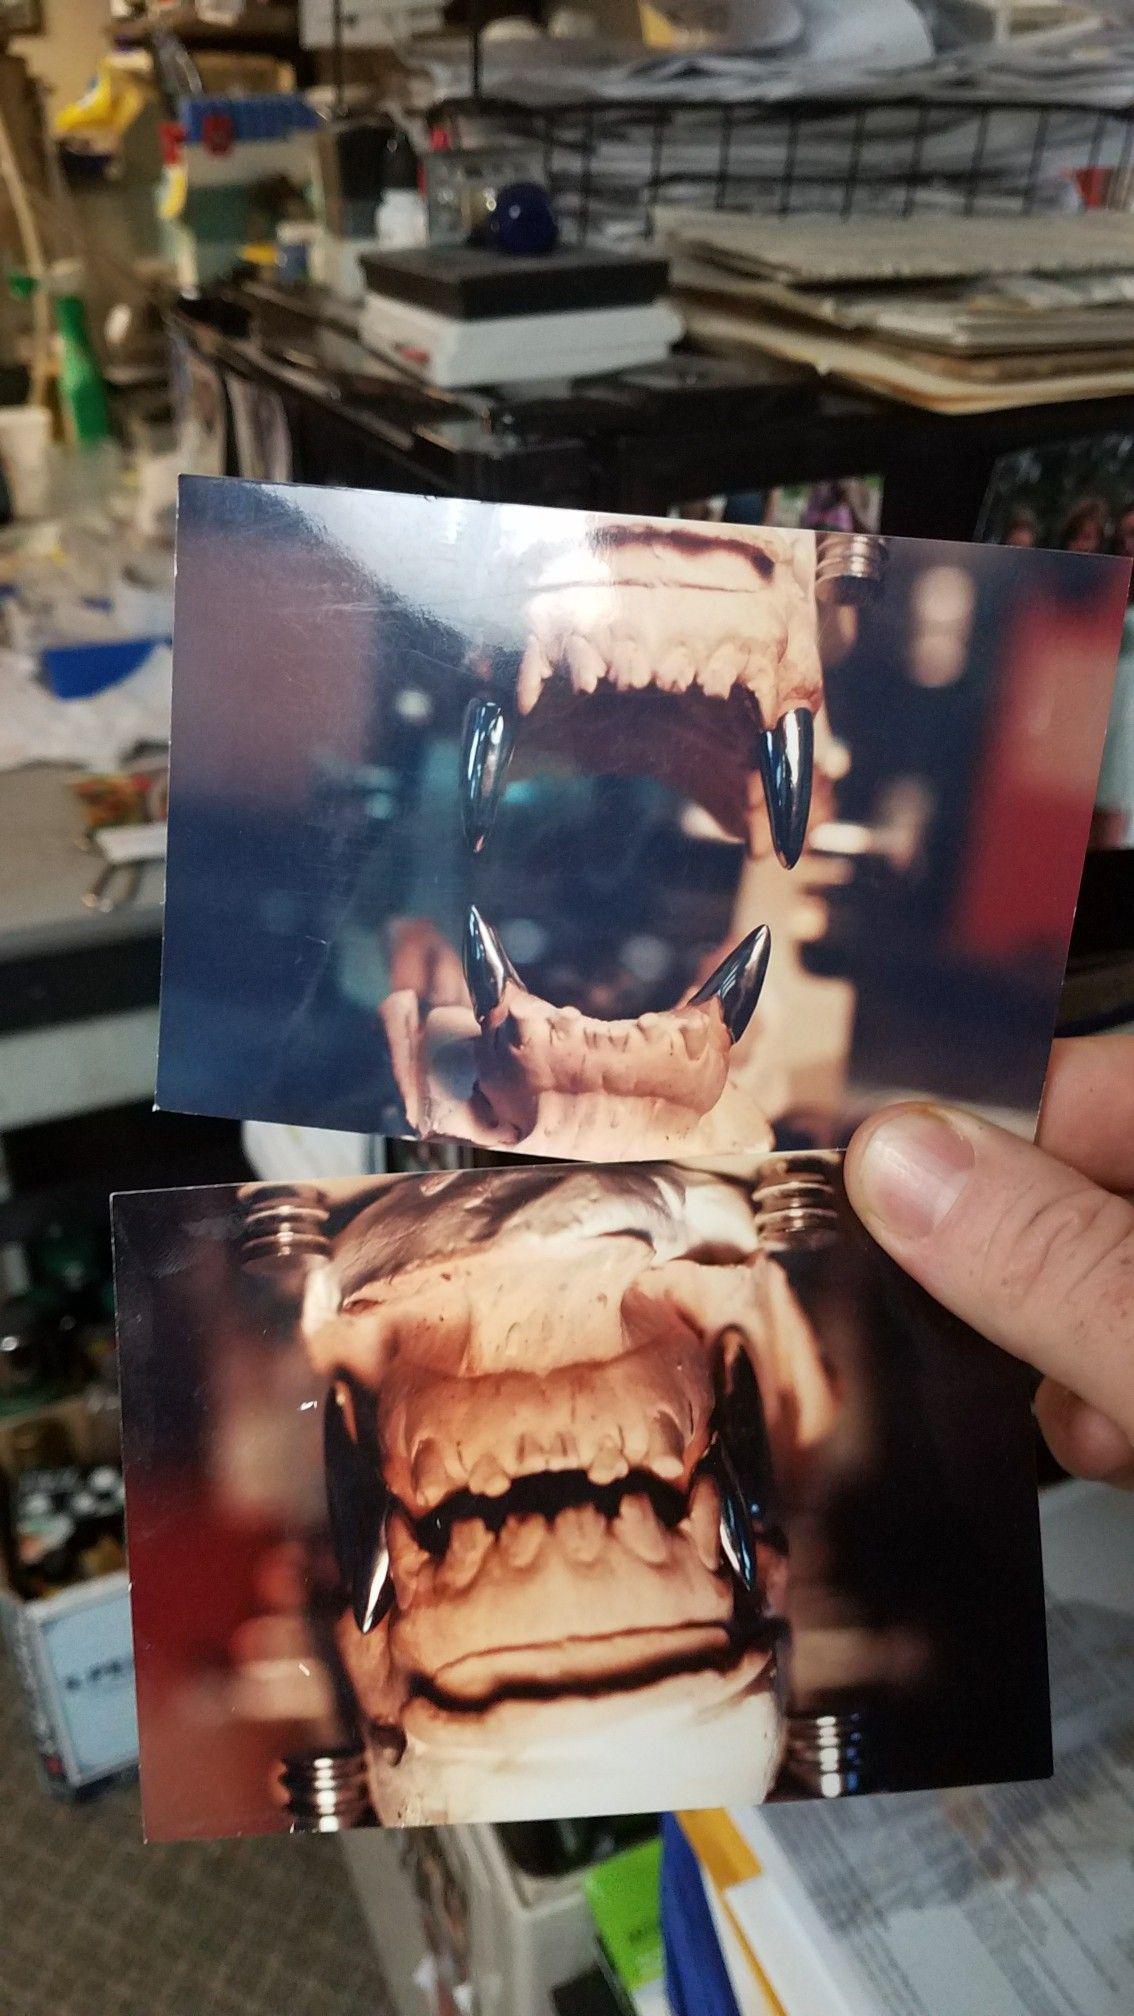 Titanium Dog Teeth : titanium, teeth, Service, Titanium, Replacement, Teeth., German, Shepherd., Stronger, Original,, Prolonging, Dogs,, Working, Shepherd